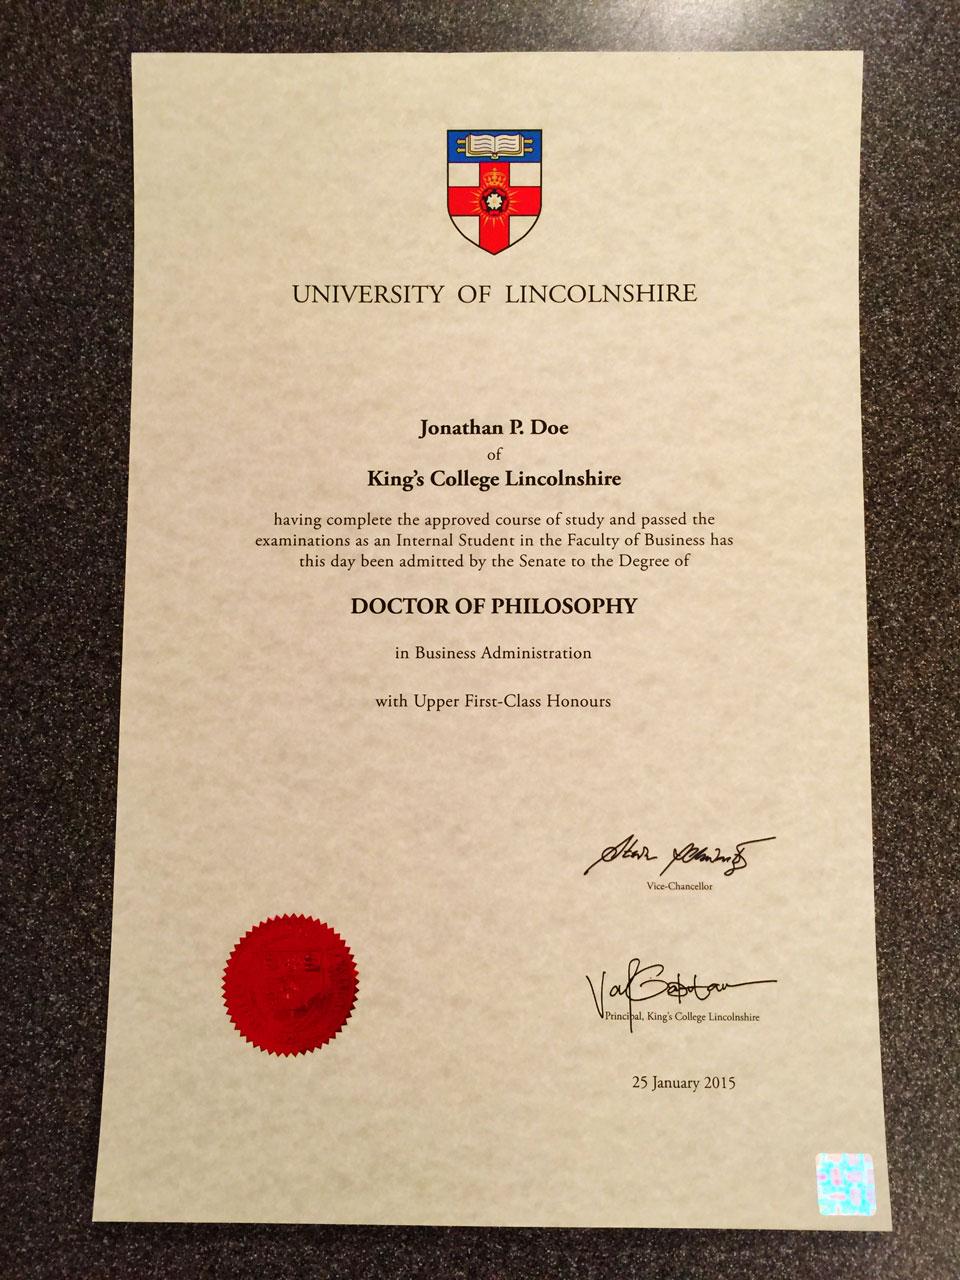 ukd02 11x17 fake uk diploma certificate